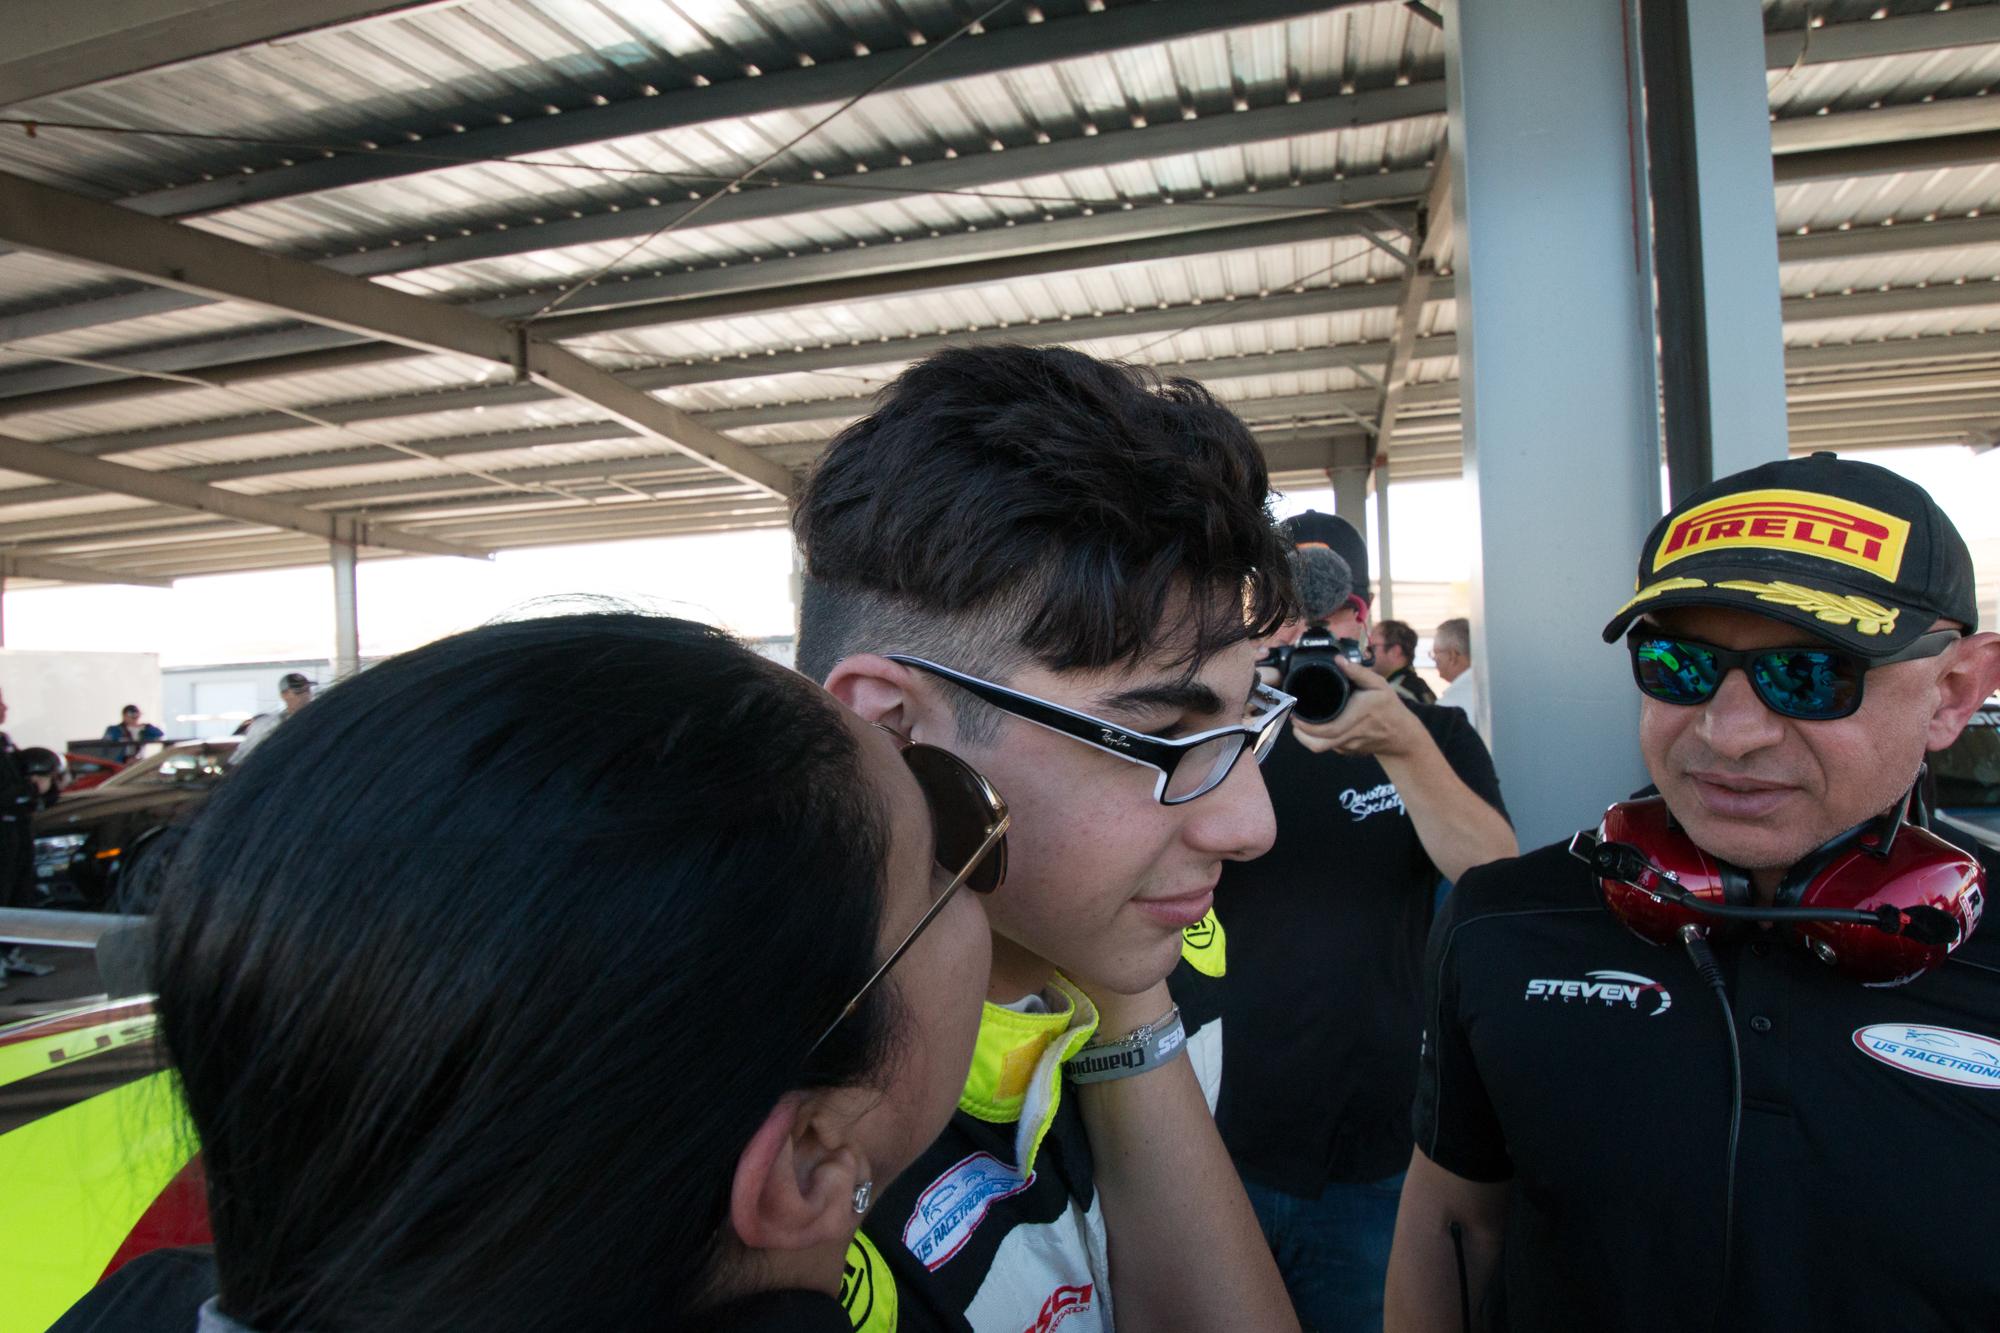 Steven-Racing-20130208-45860.jpg